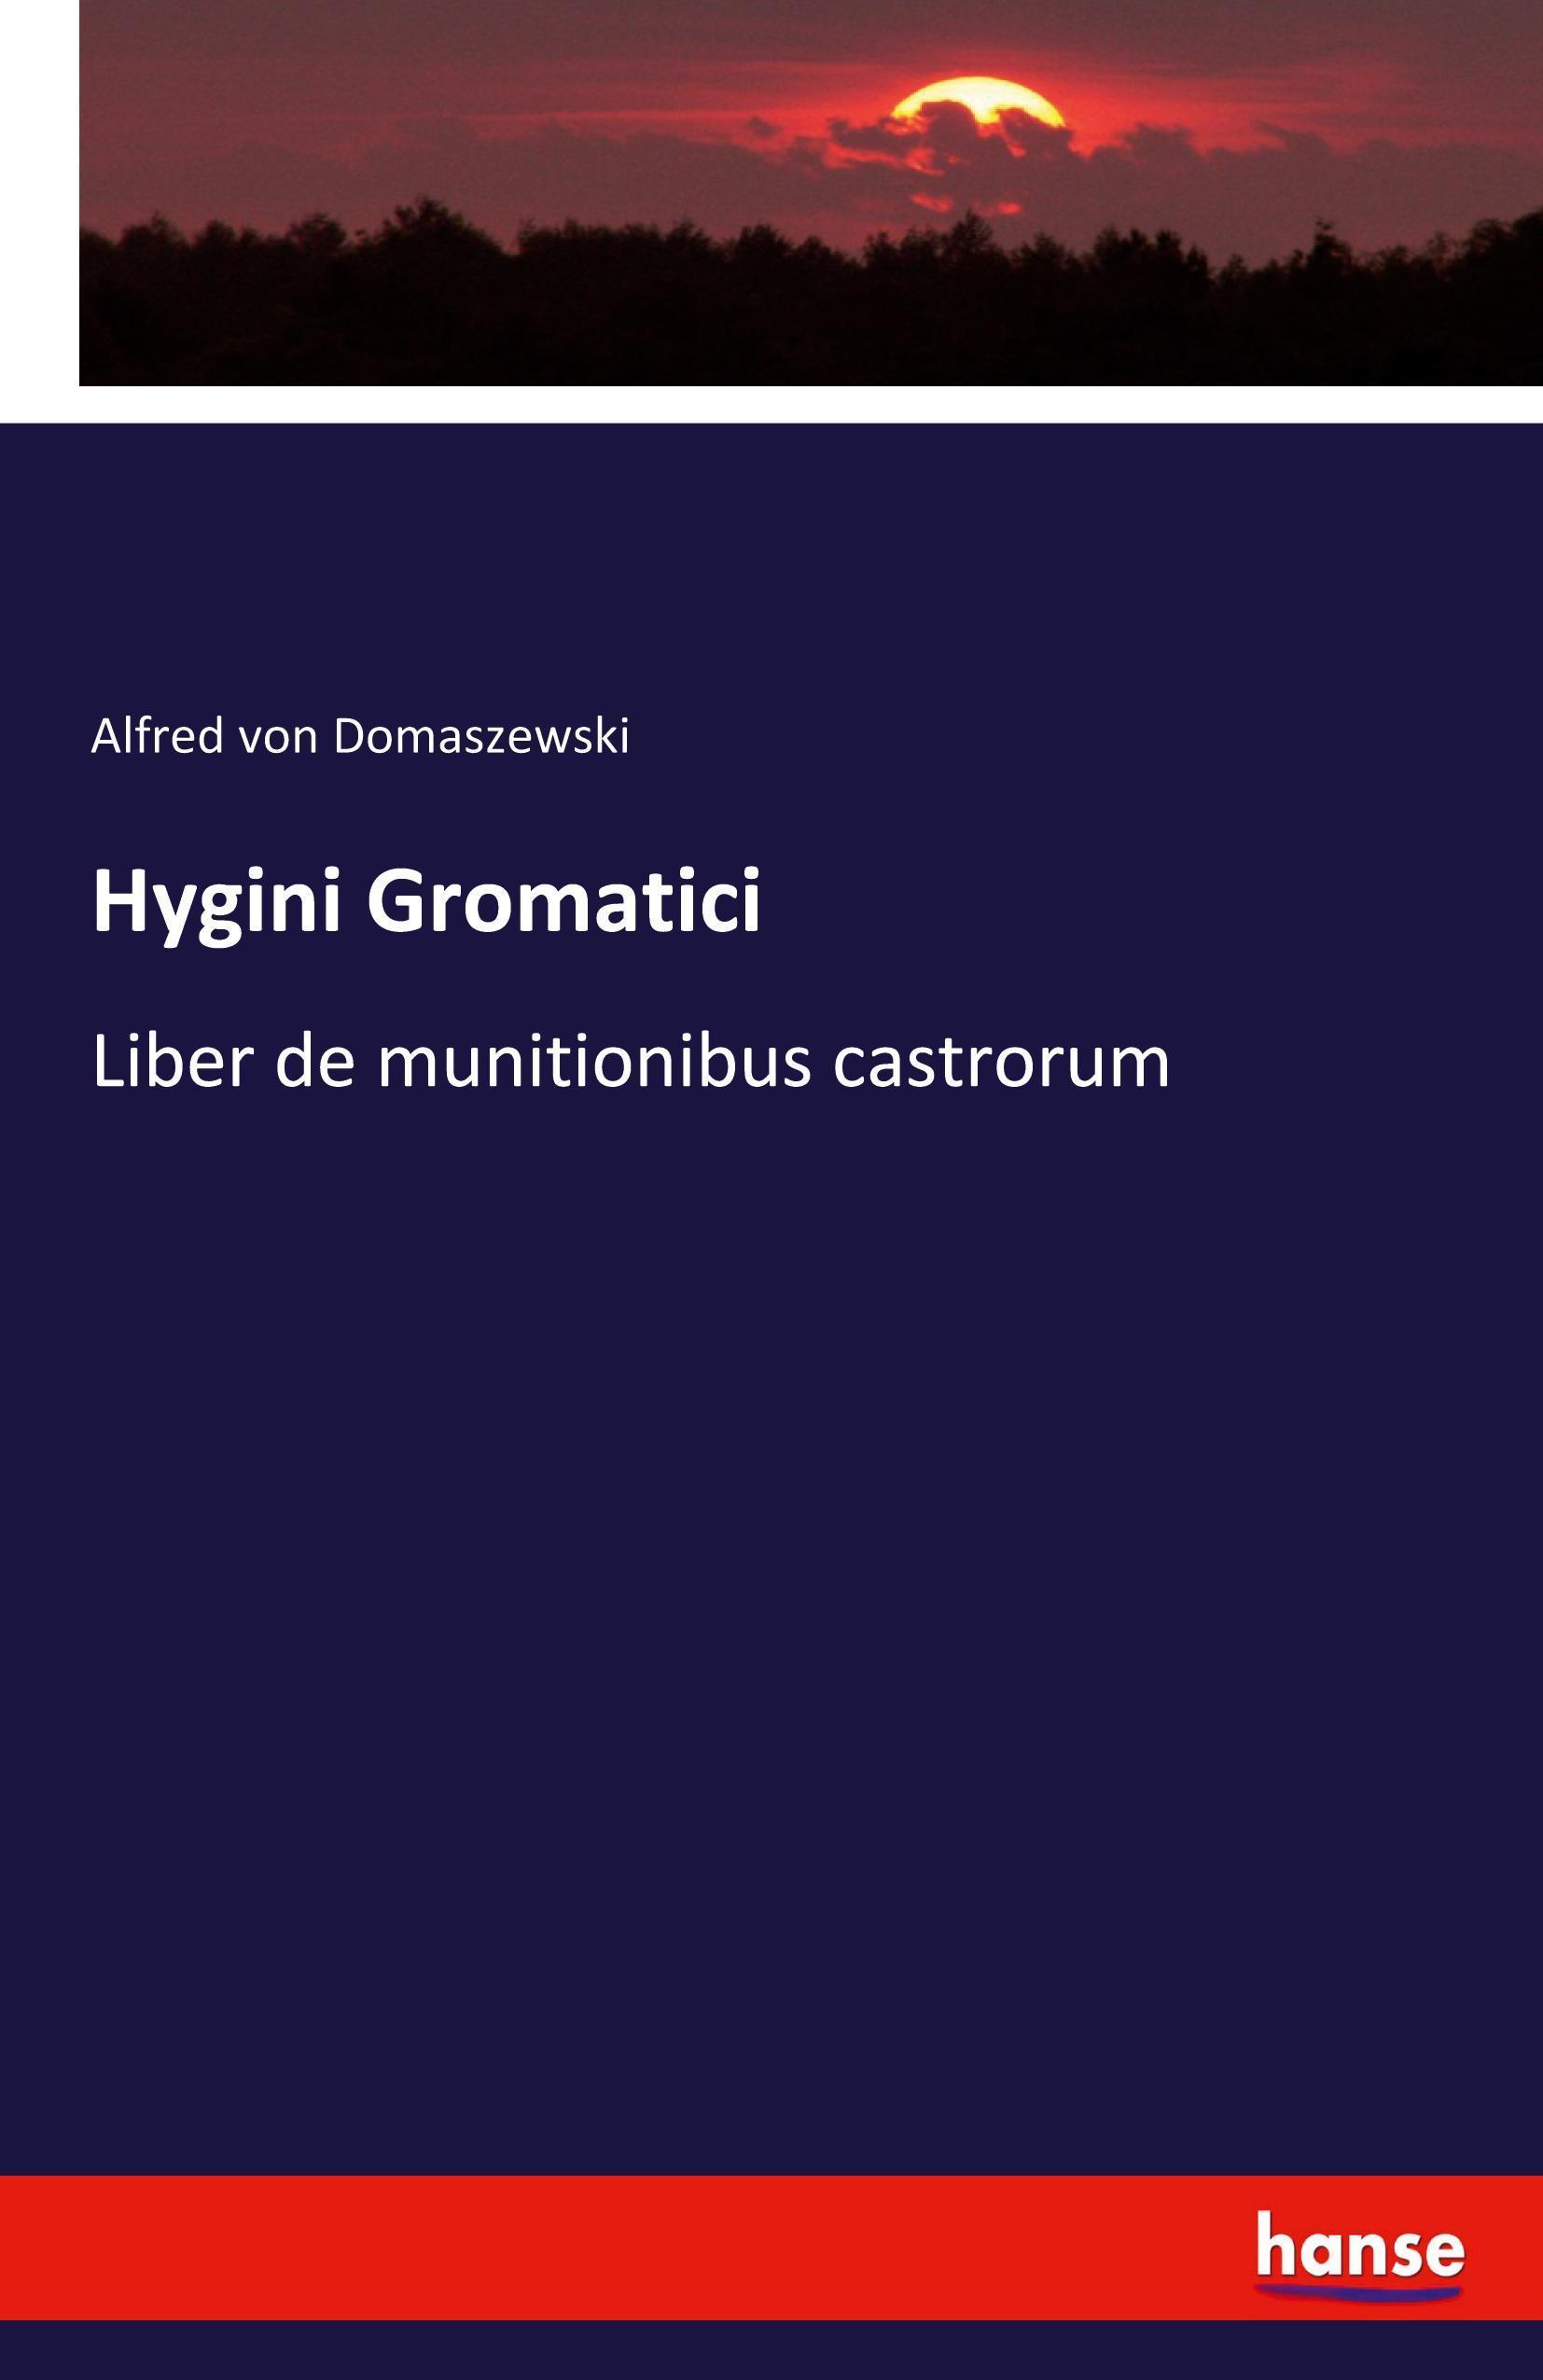 Hygini Gromatici Liber de munitionibus castrorum | Alfred vo ... 9783741196812